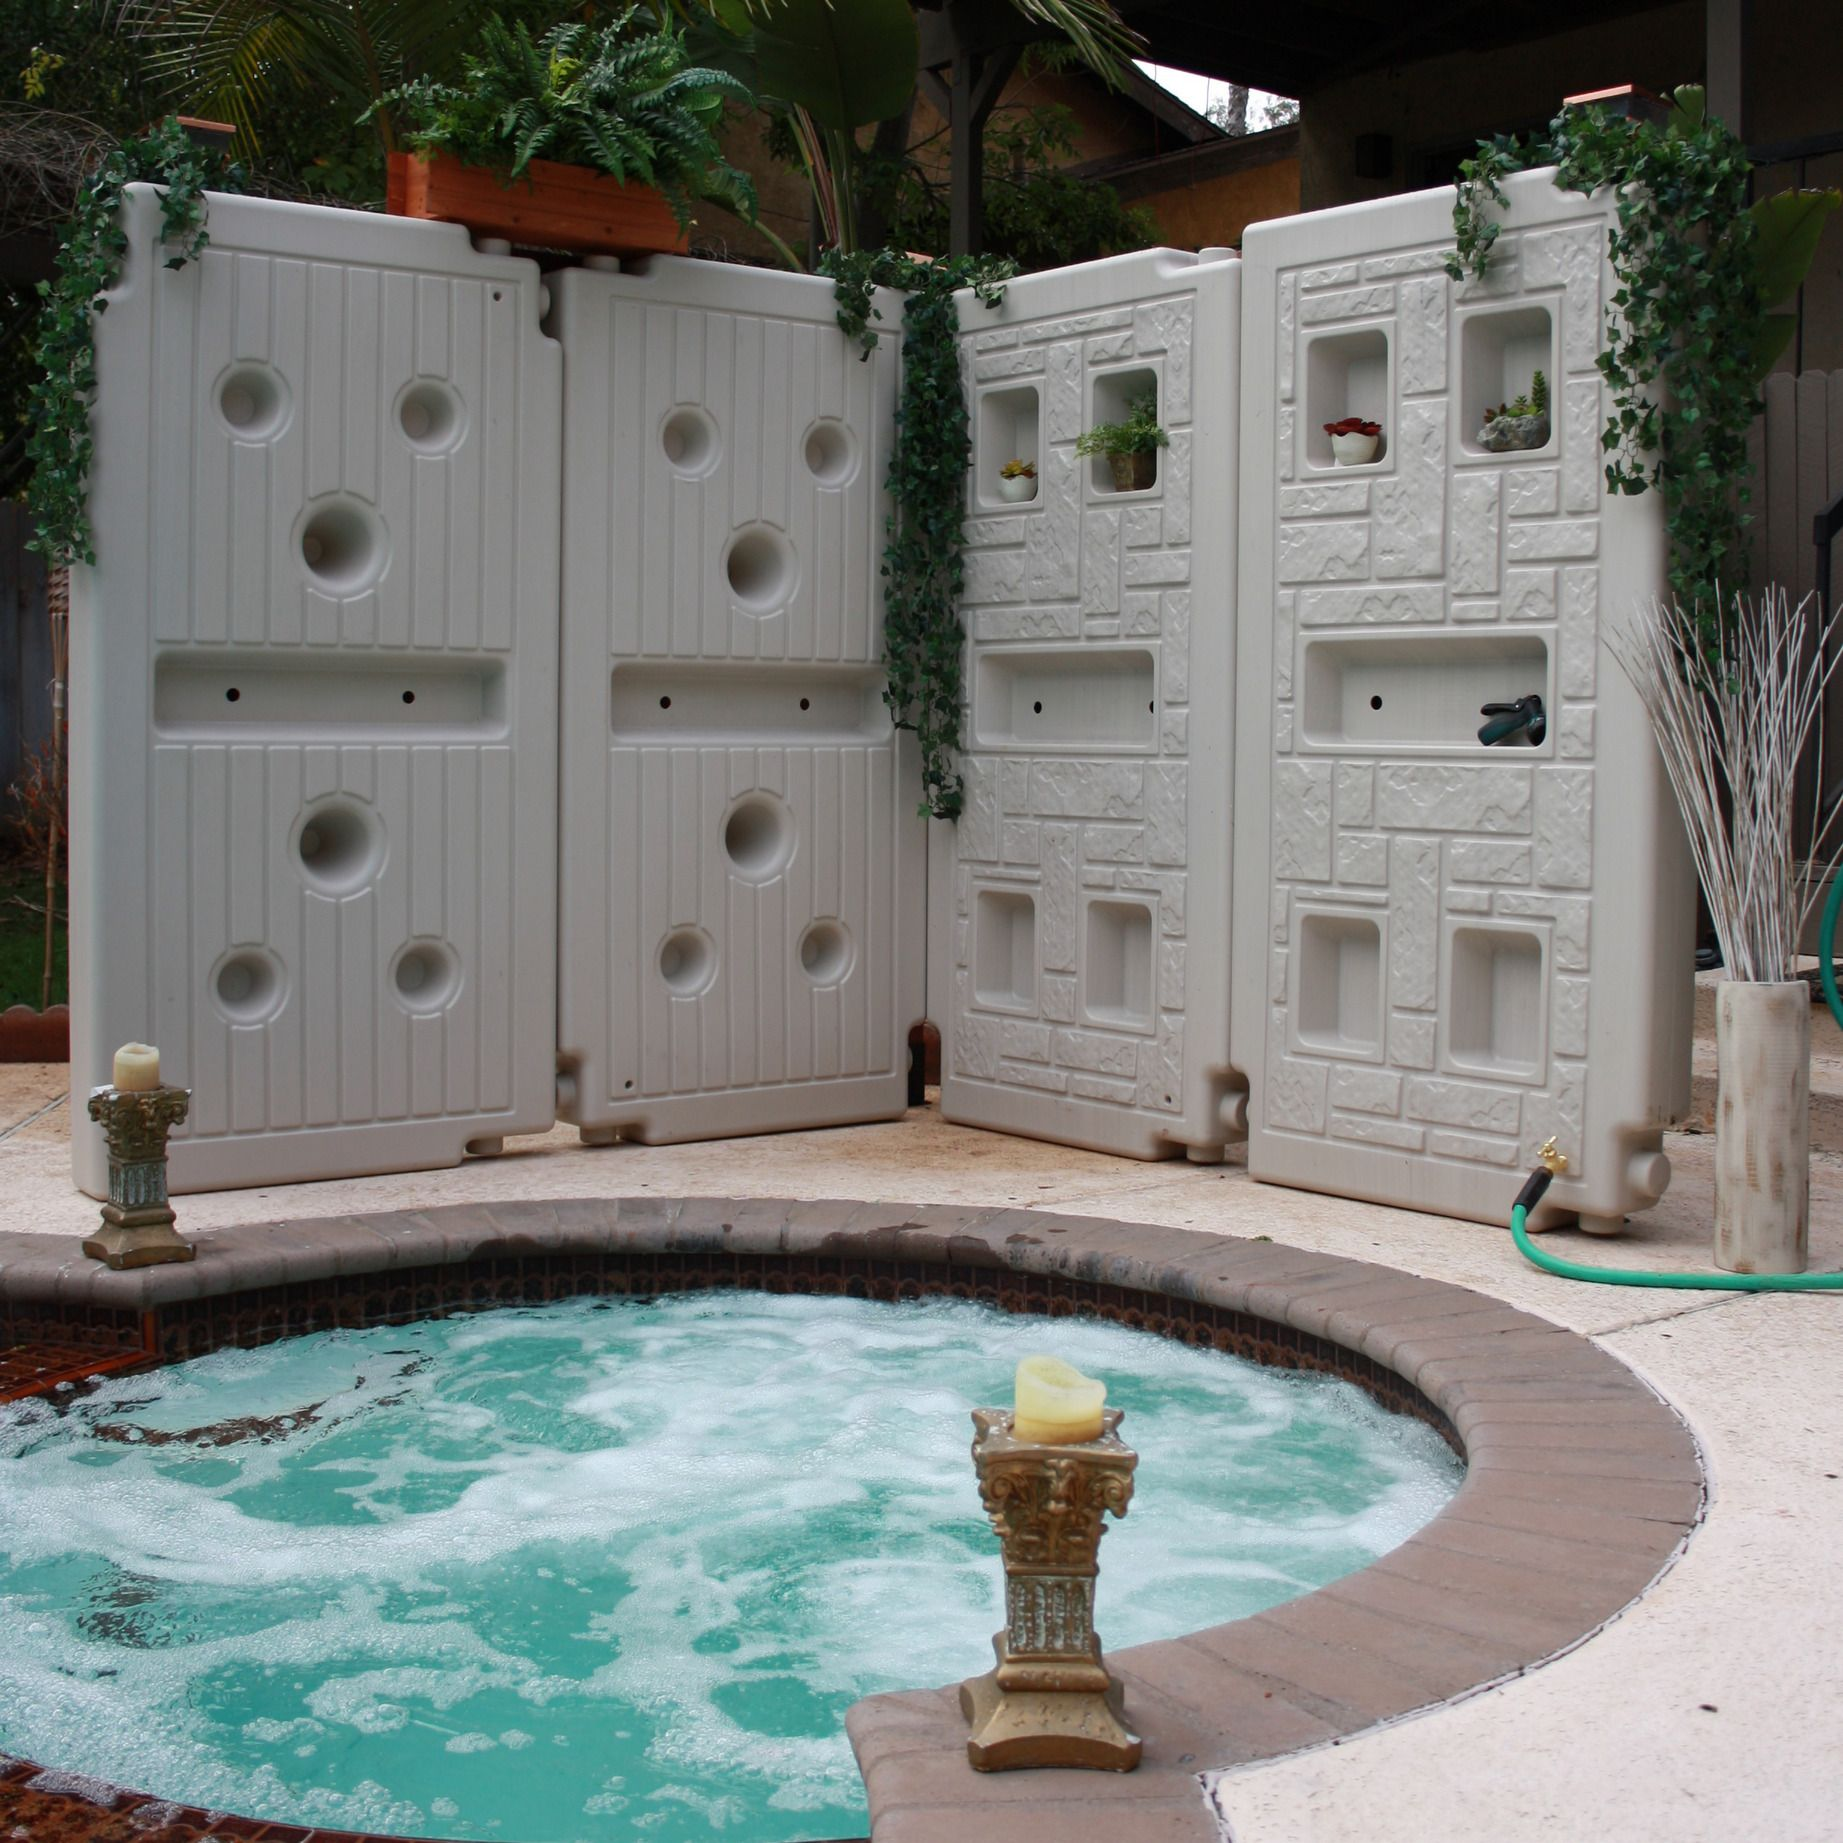 Rain Harvesting system plus solar pool heater sweet